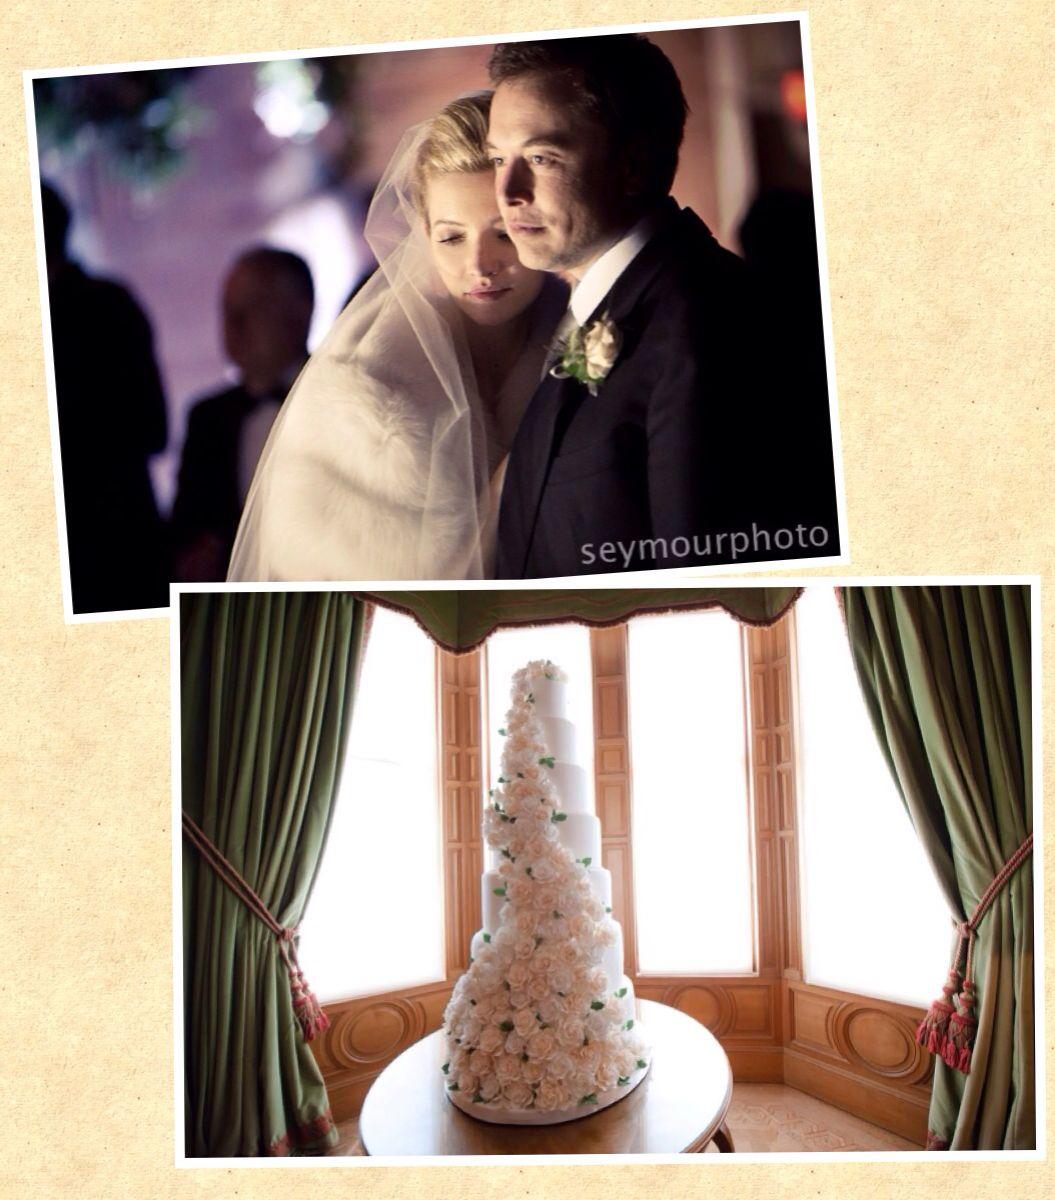 Talulah Riley and Elon Musk wedding cake | Famous Wedding Cakes